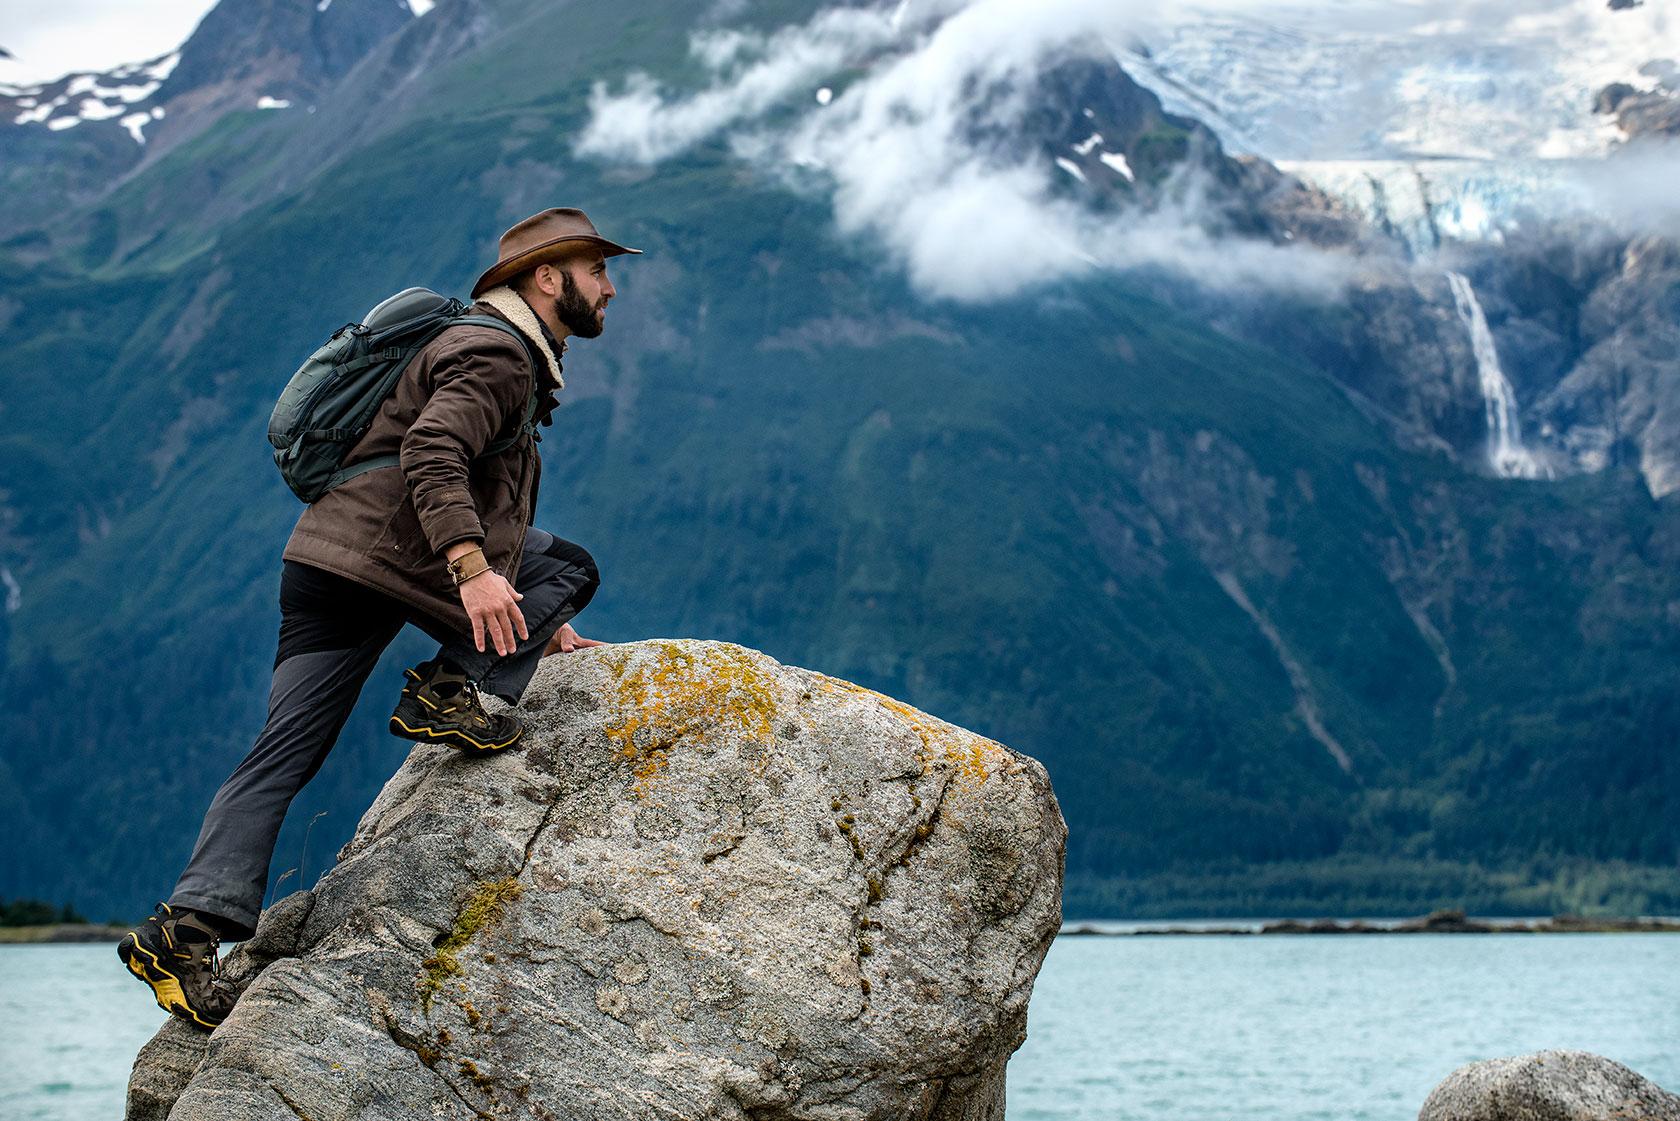 austin-trigg-brave-wilderness-alaska-BW-Coyote-Climbs-Rock-Chilkat-Park.jpg